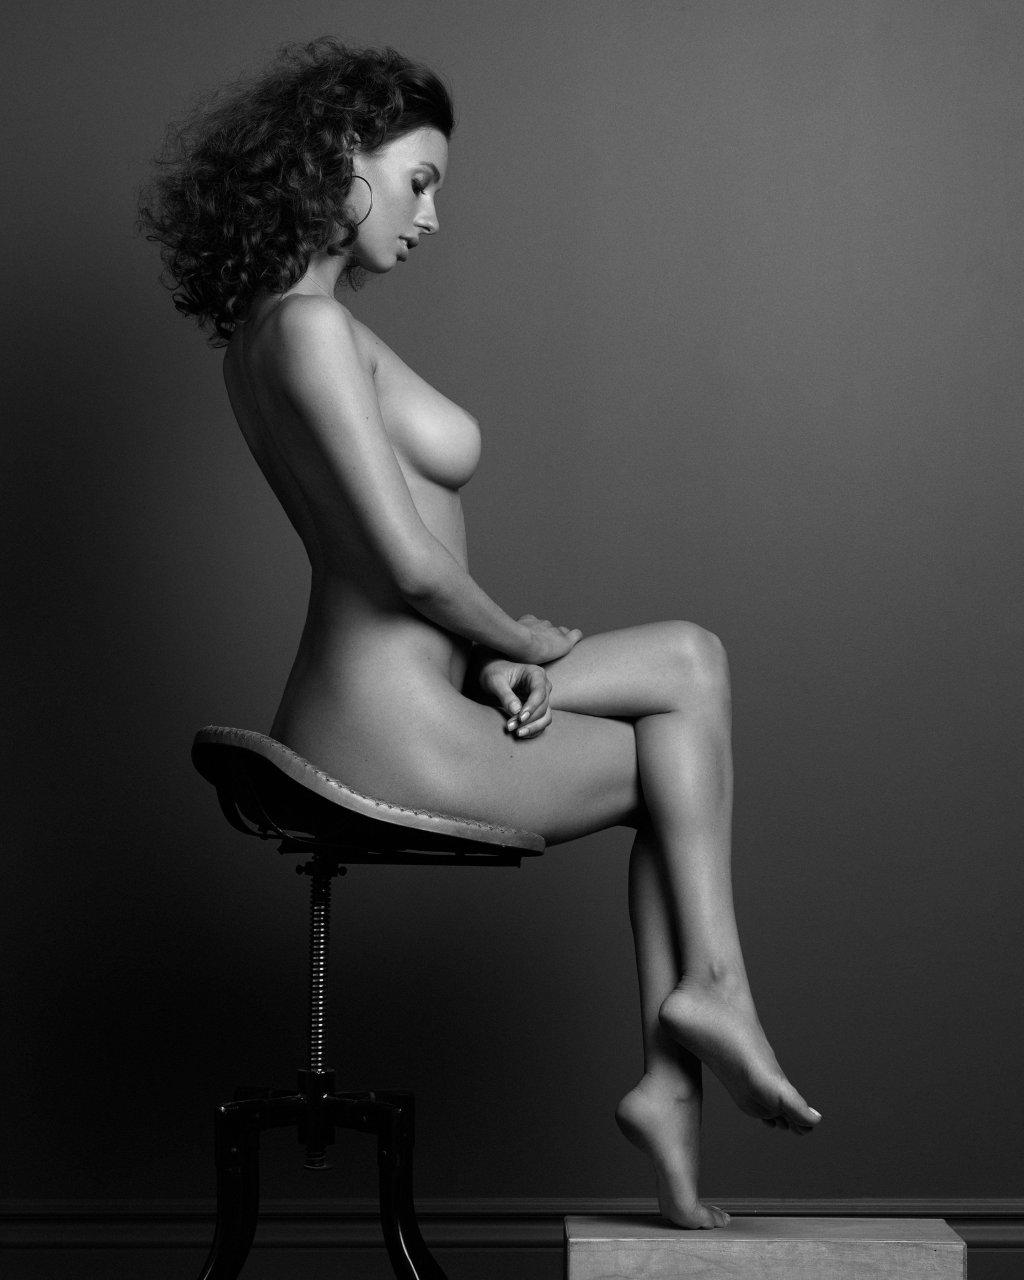 Tillie nude pics — 10